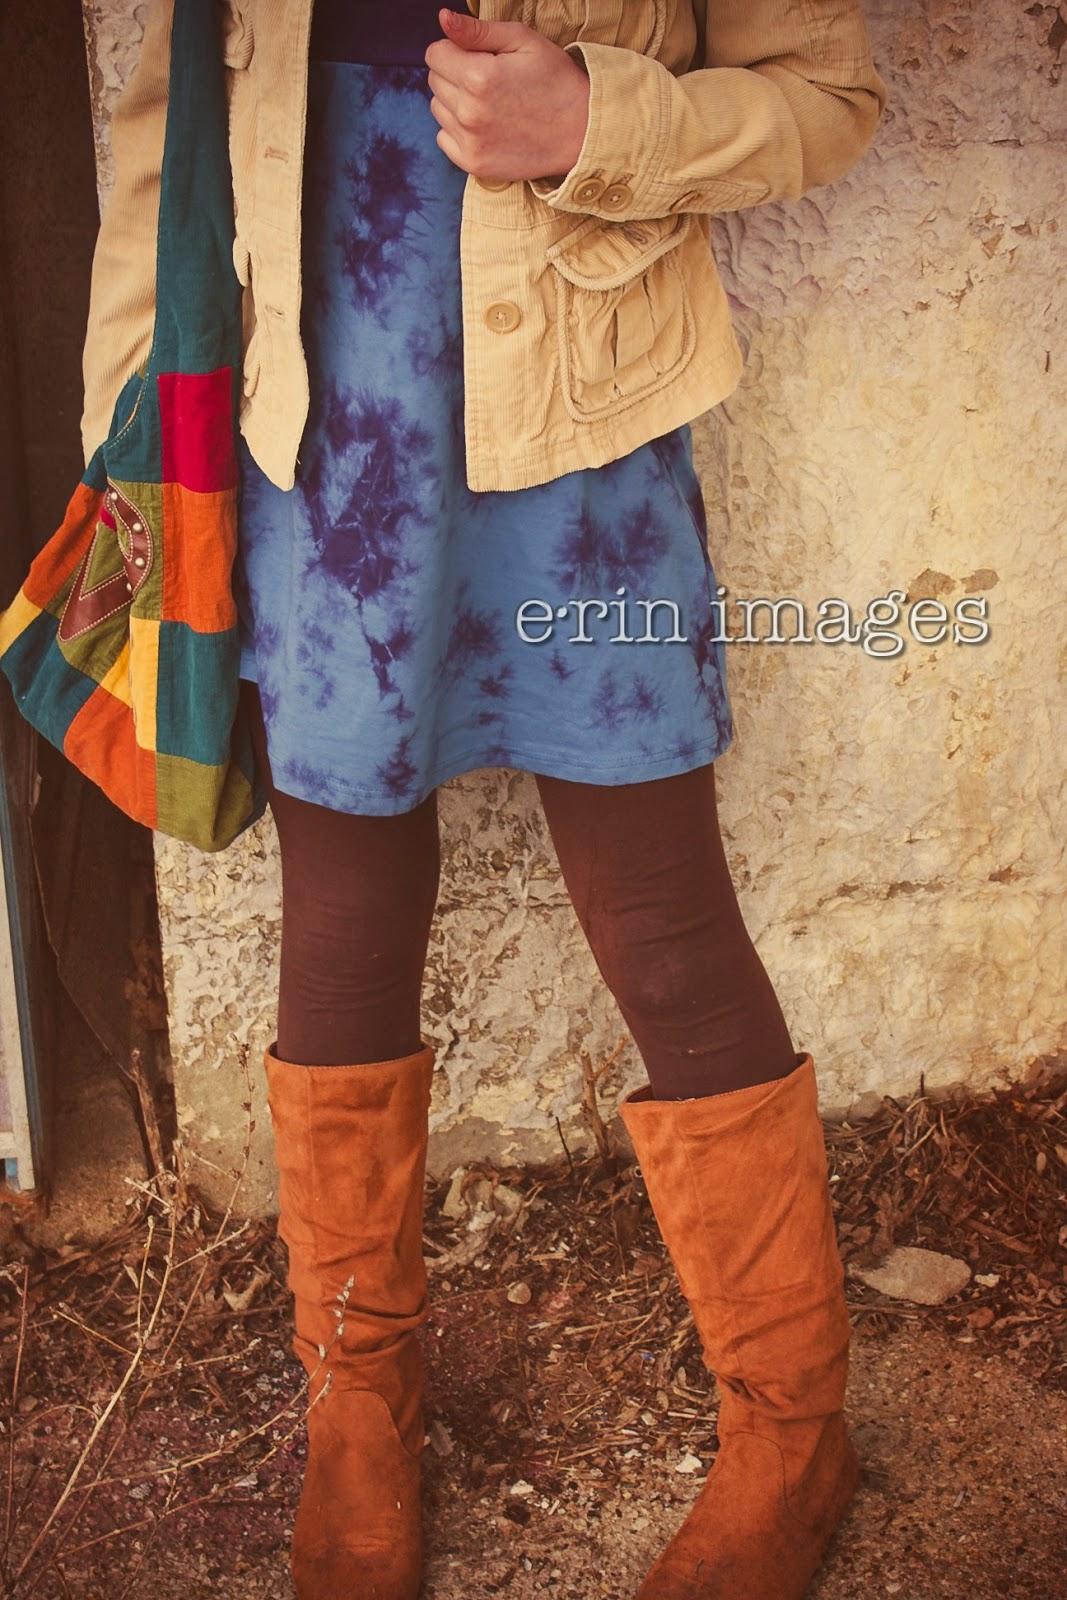 hippie+tiedye+skirt - The Retro Vibe of Tie-Dye